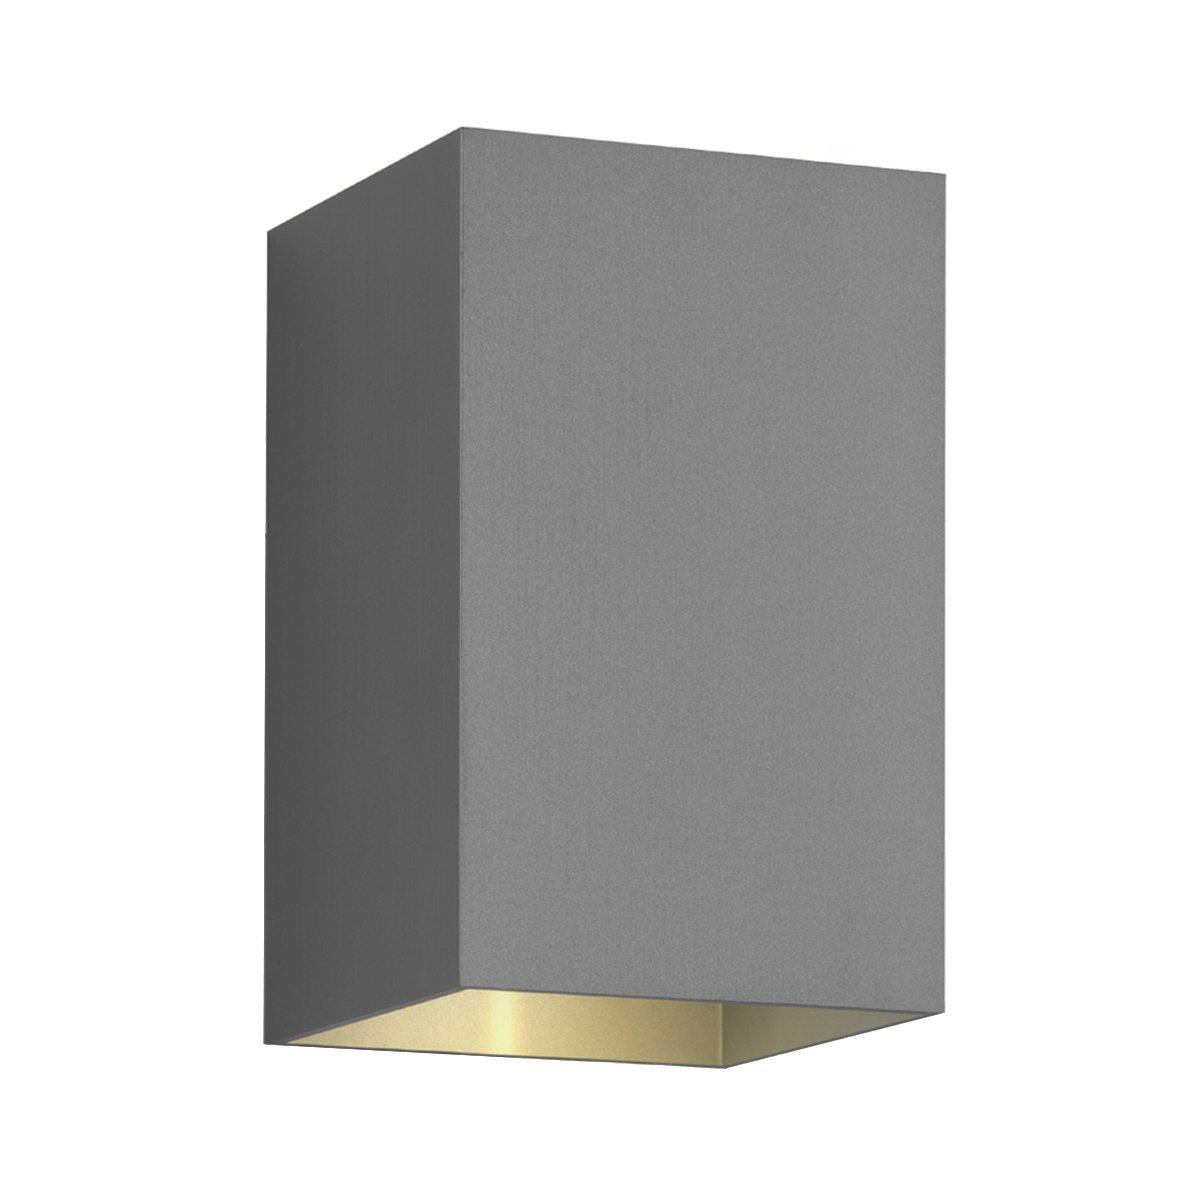 Wever & Ducr� Box 4.0 Outdoor Wandlamp Grijs - 3000 Kelvin